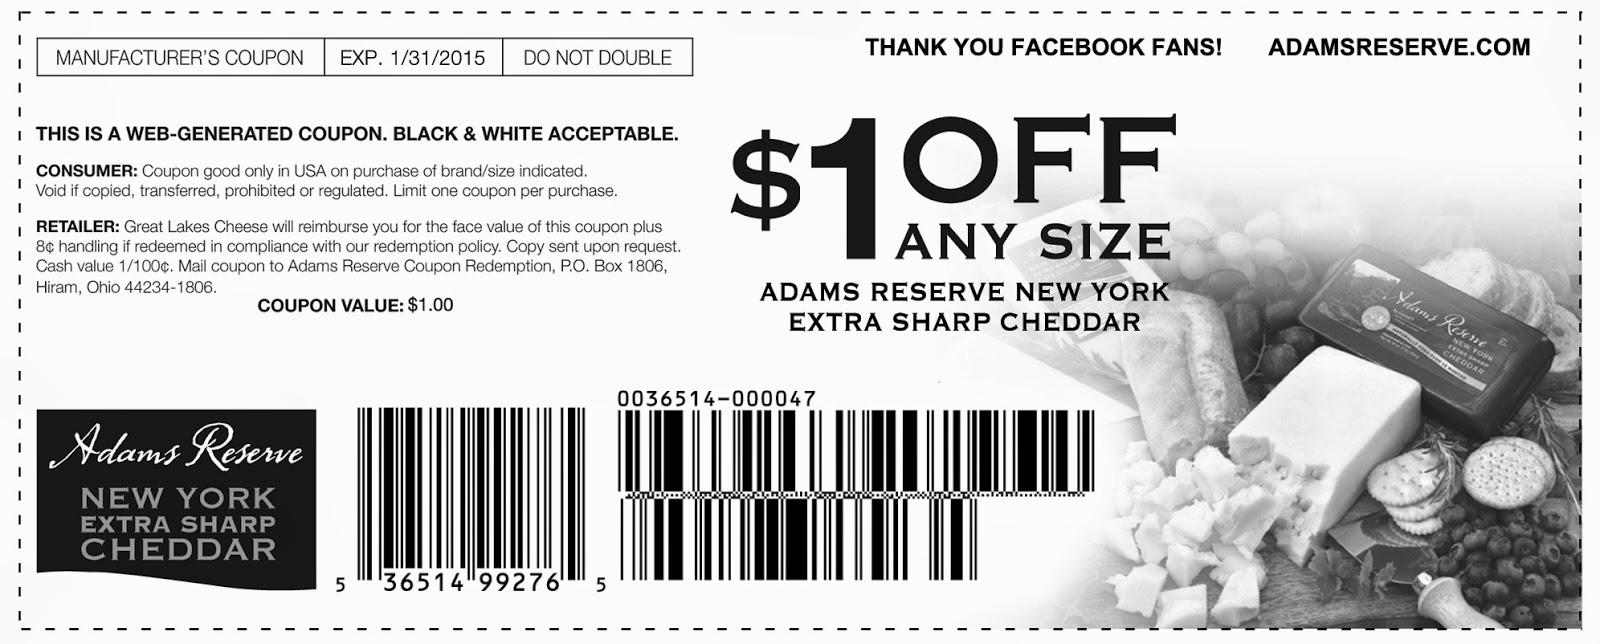 York photo coupon code